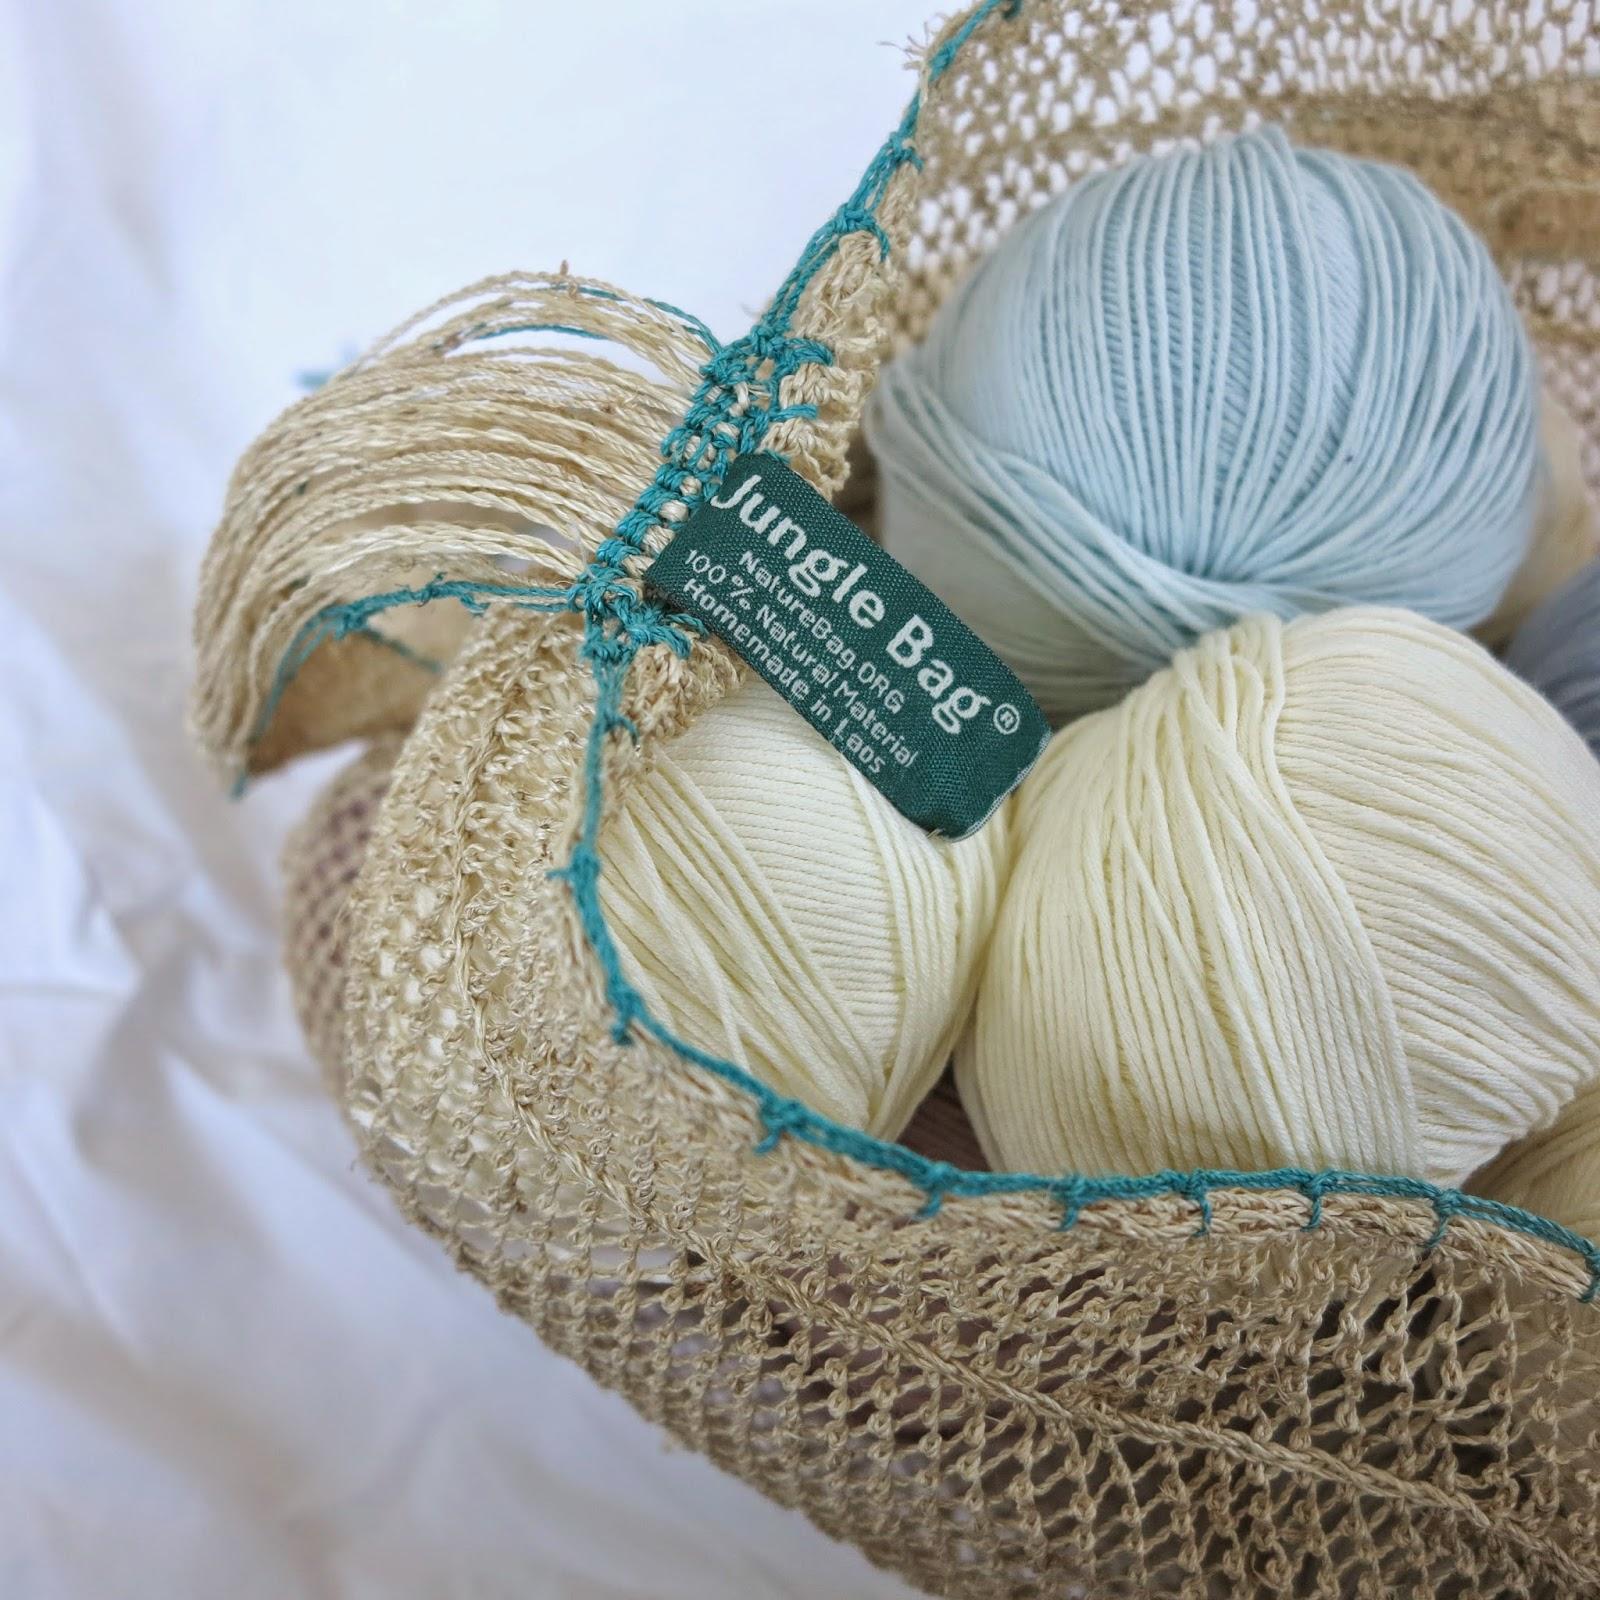 ByHaafner, Nature Bag, kudzu, JungleVine, yarn bag